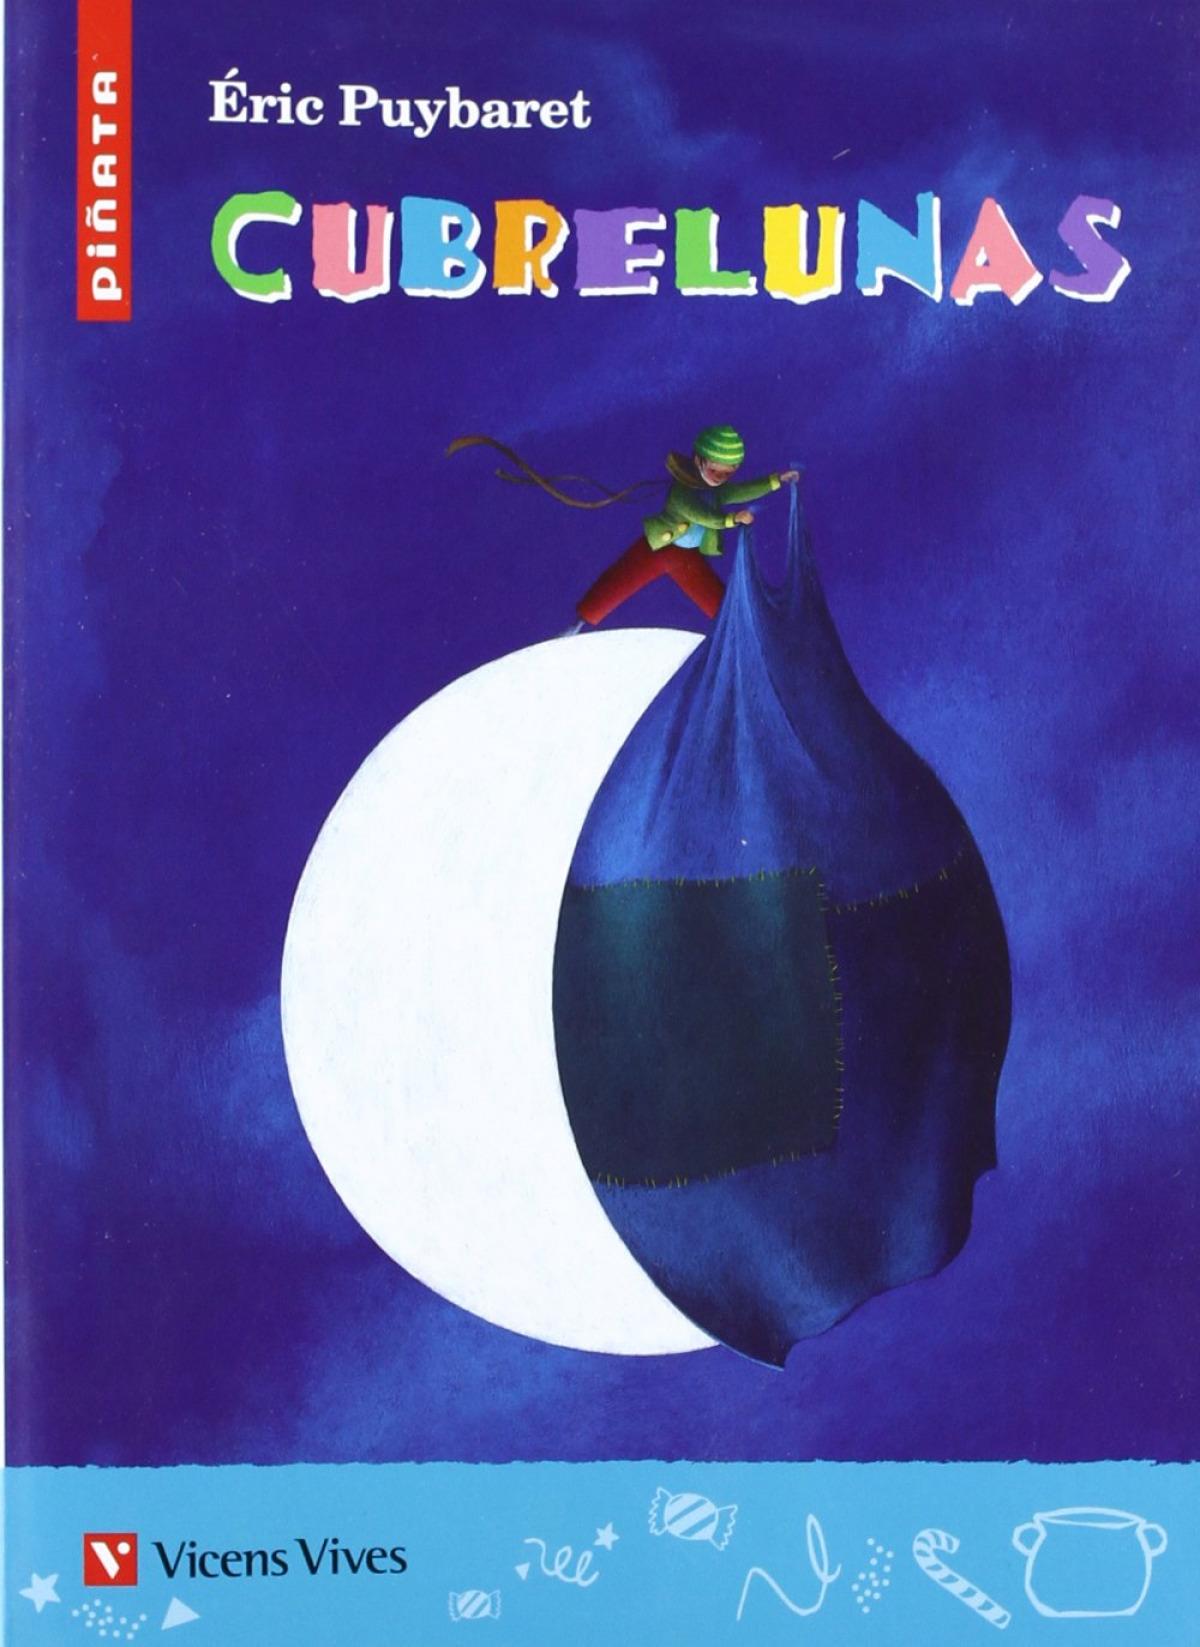 Cubrelunas - Sánchez Aguilar, Agustín/Languereau, Gautier/Puybaret, Eric